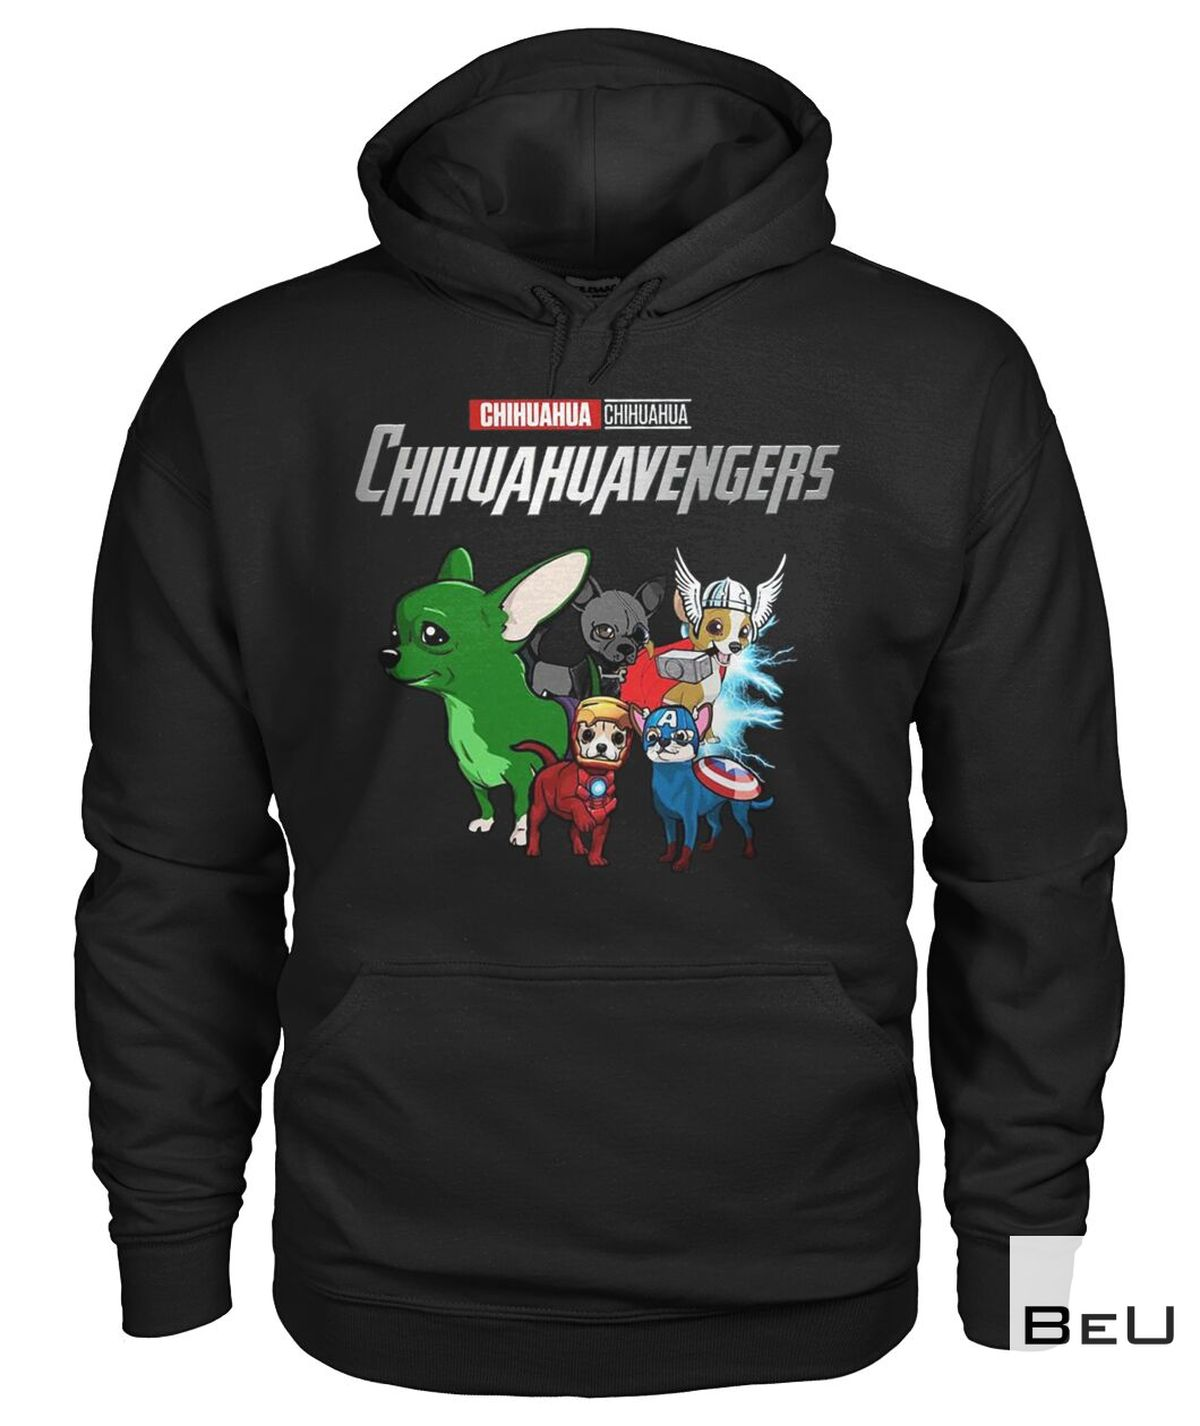 Chihuahua Chihuahuavengers Avengers Shirtz